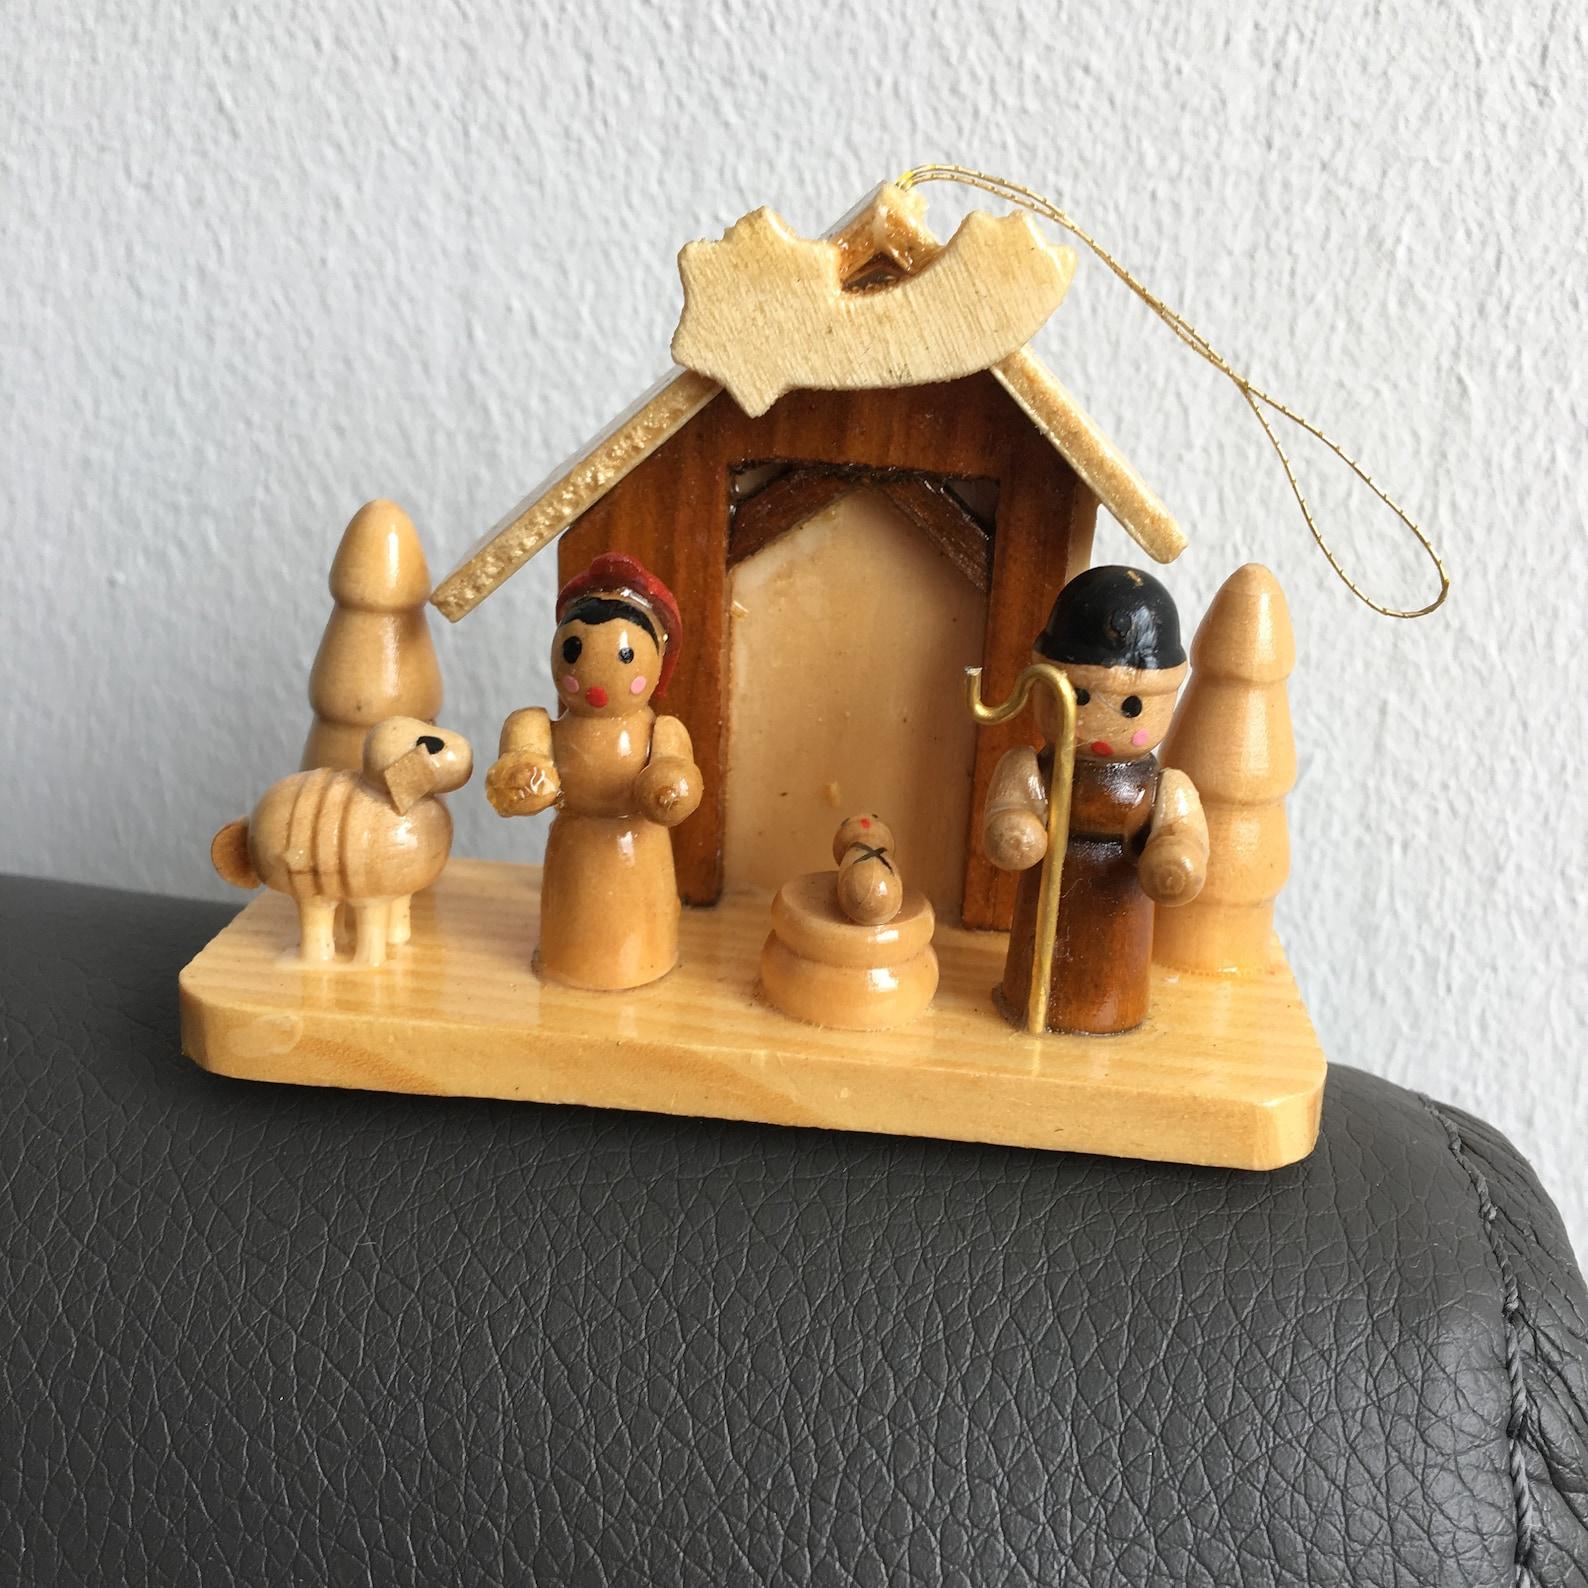 Vintage Wooden Nativity Scene Christmas Tree Ornament Toys Germany Crib